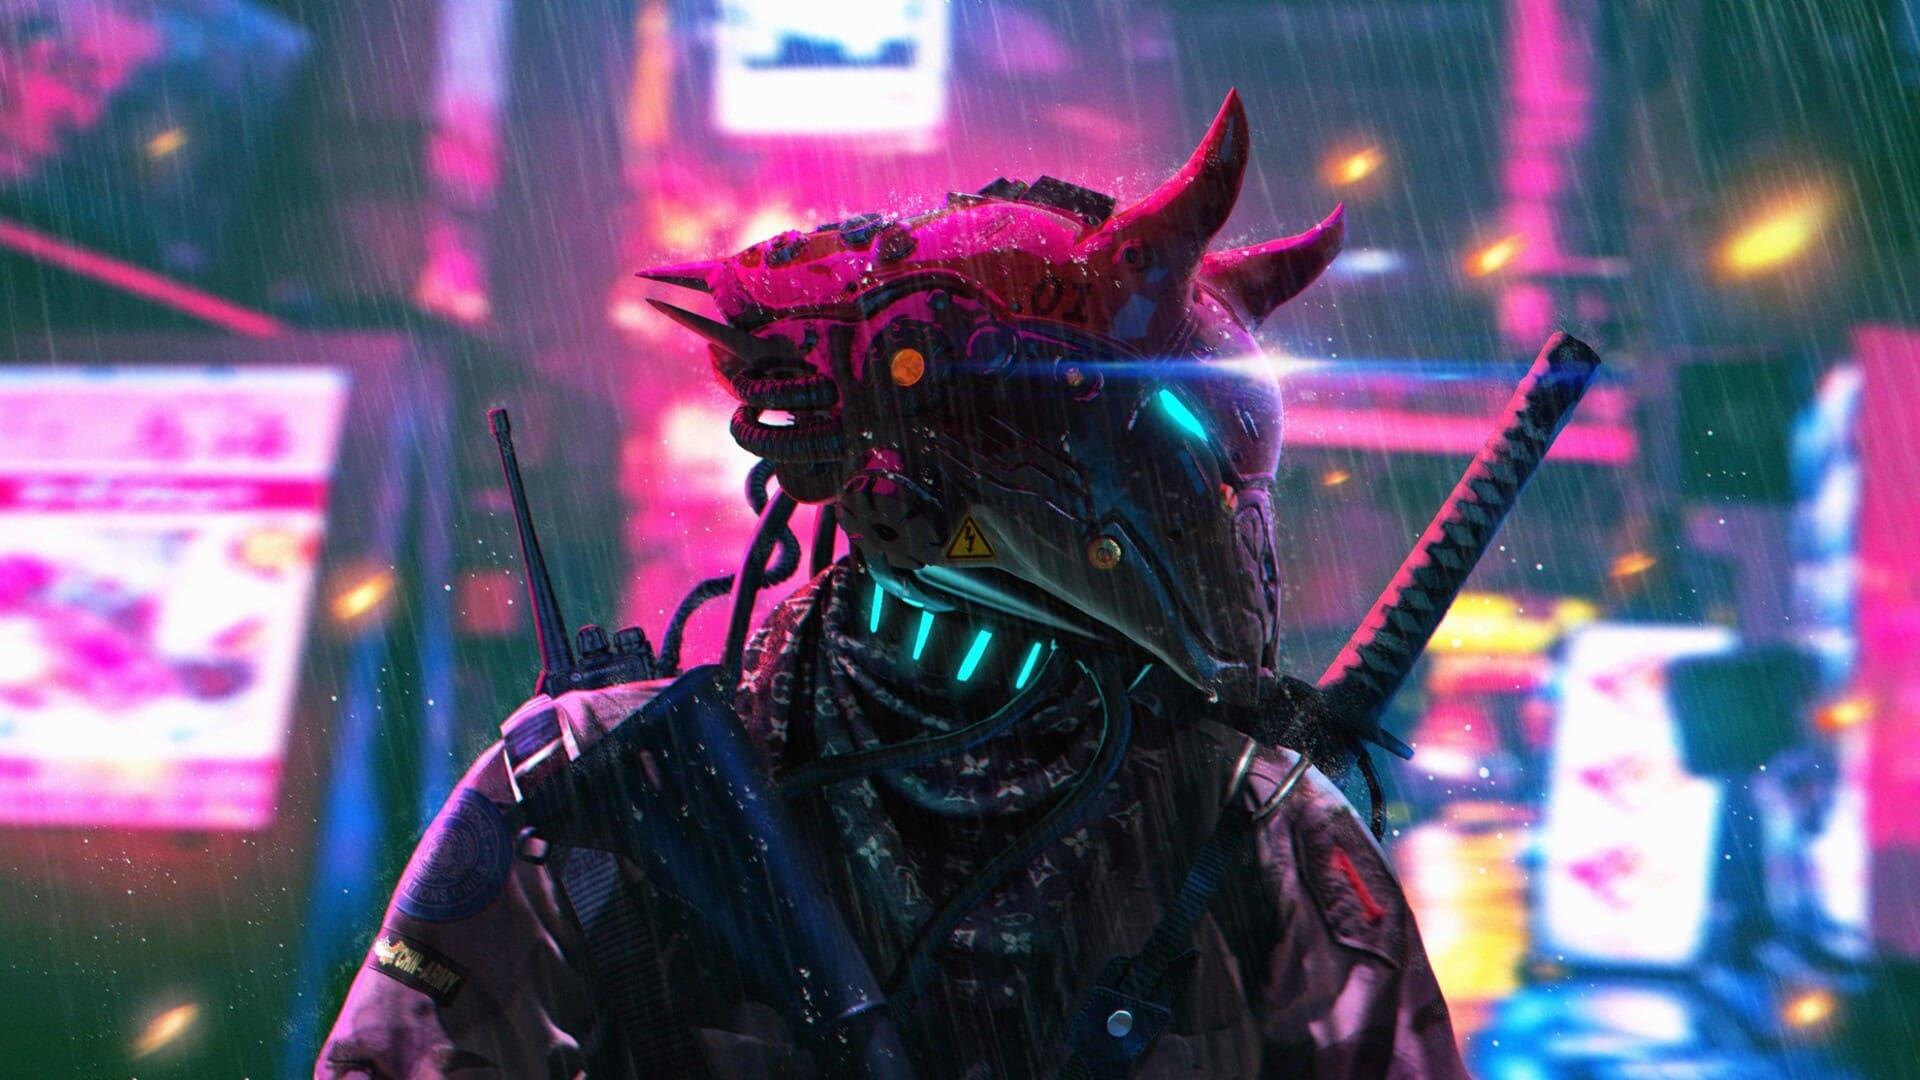 cyberpunk profile picture